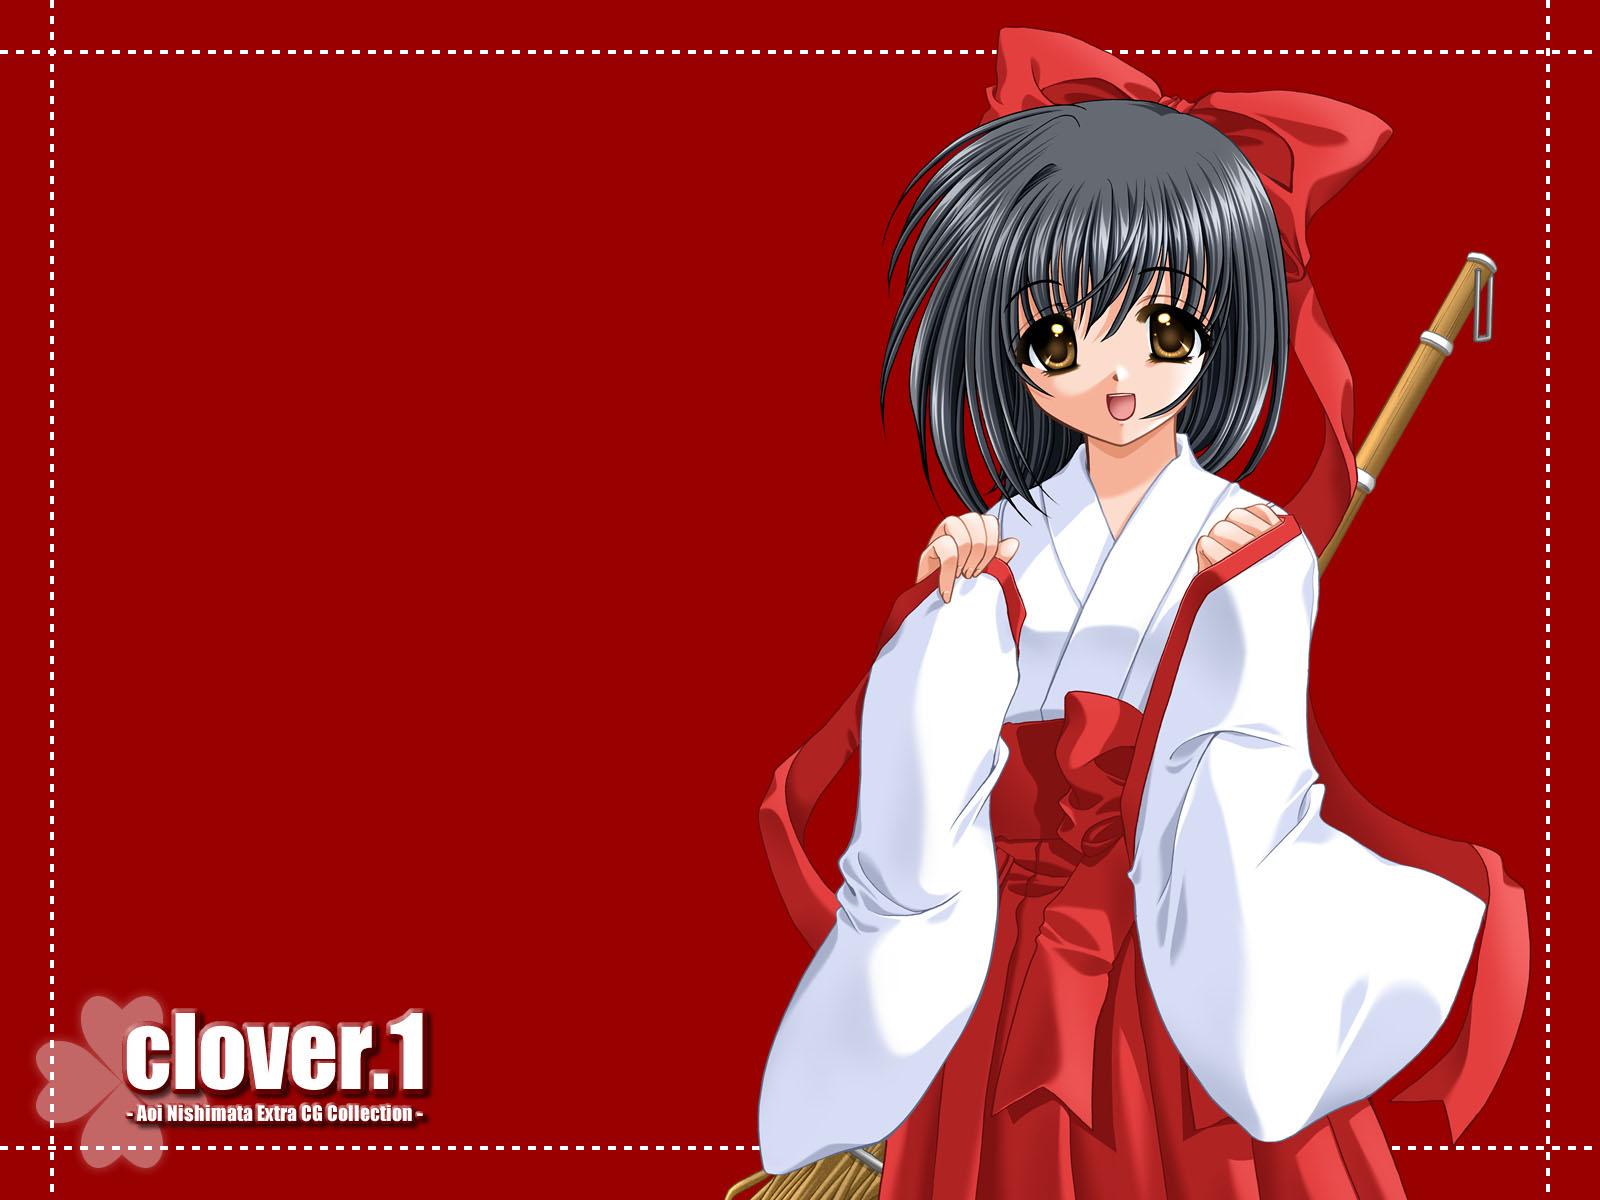 japanese_clothes miko nishimata_aoi red